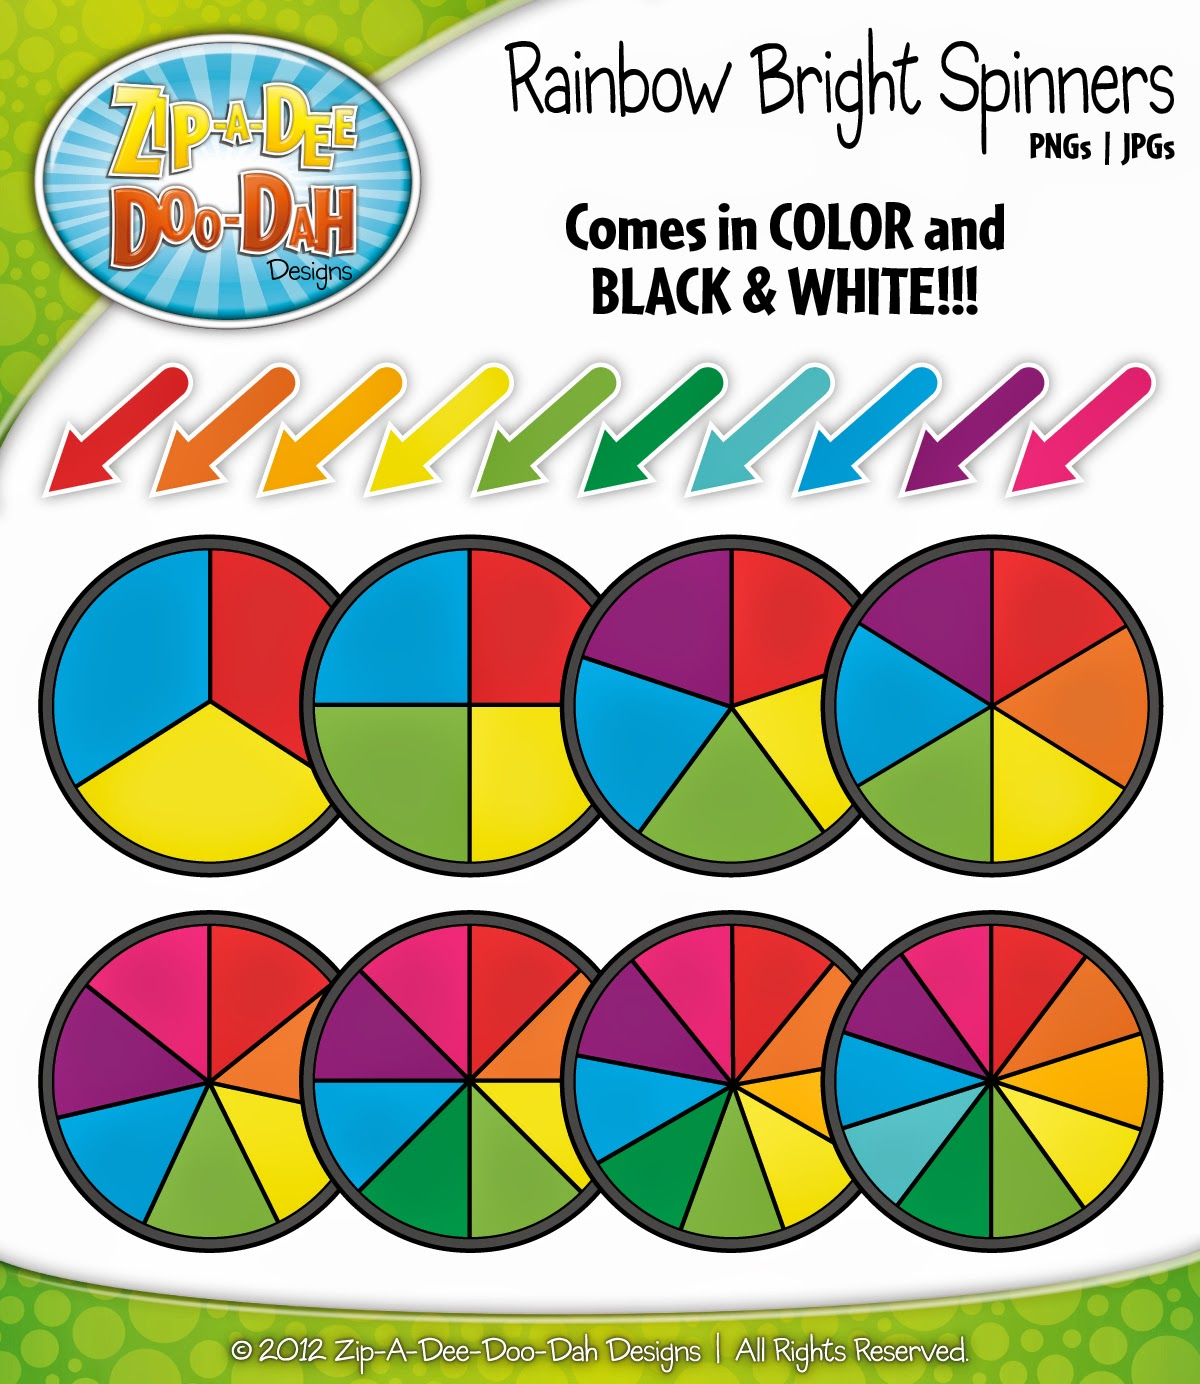 http://www.teacherspayteachers.com/Product/Rainbow-Bright-Spinners-Clipart-Mega-Set-Over-40-Graphics-549900